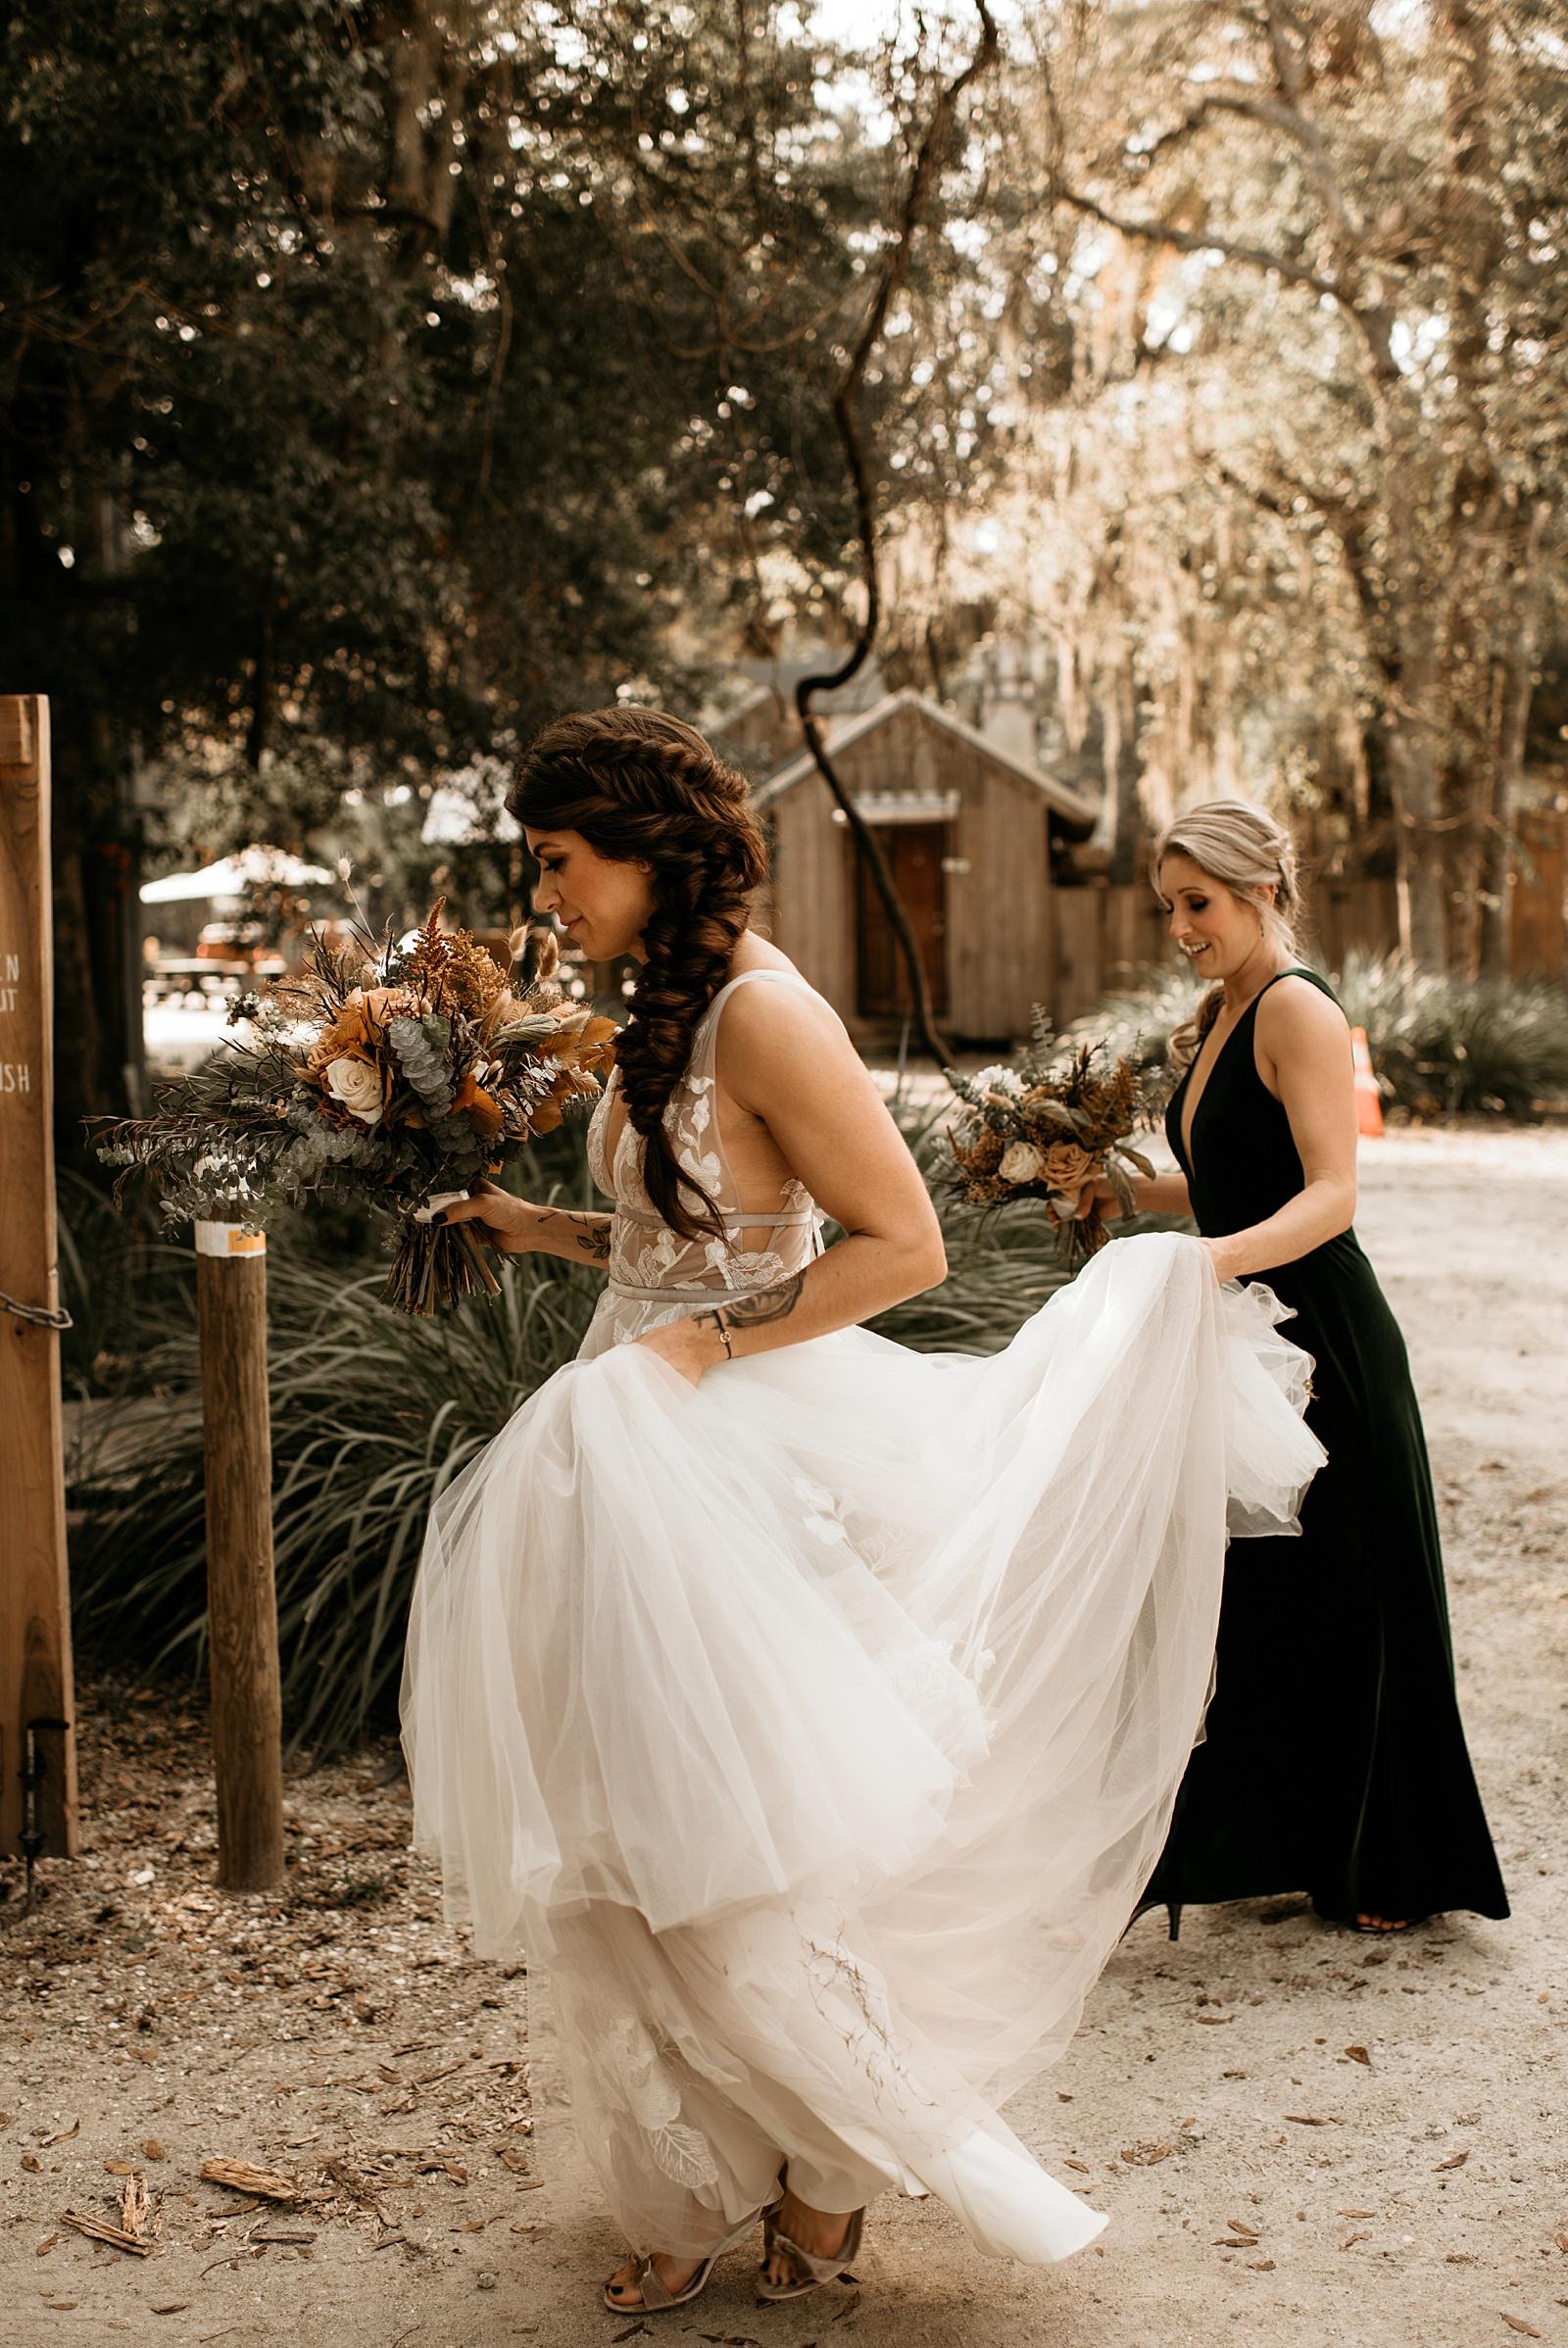 destination wedding photographer,elopement photographer,fountain of youth,fountain of youth wedding,st. augustine florida wedding photographer,